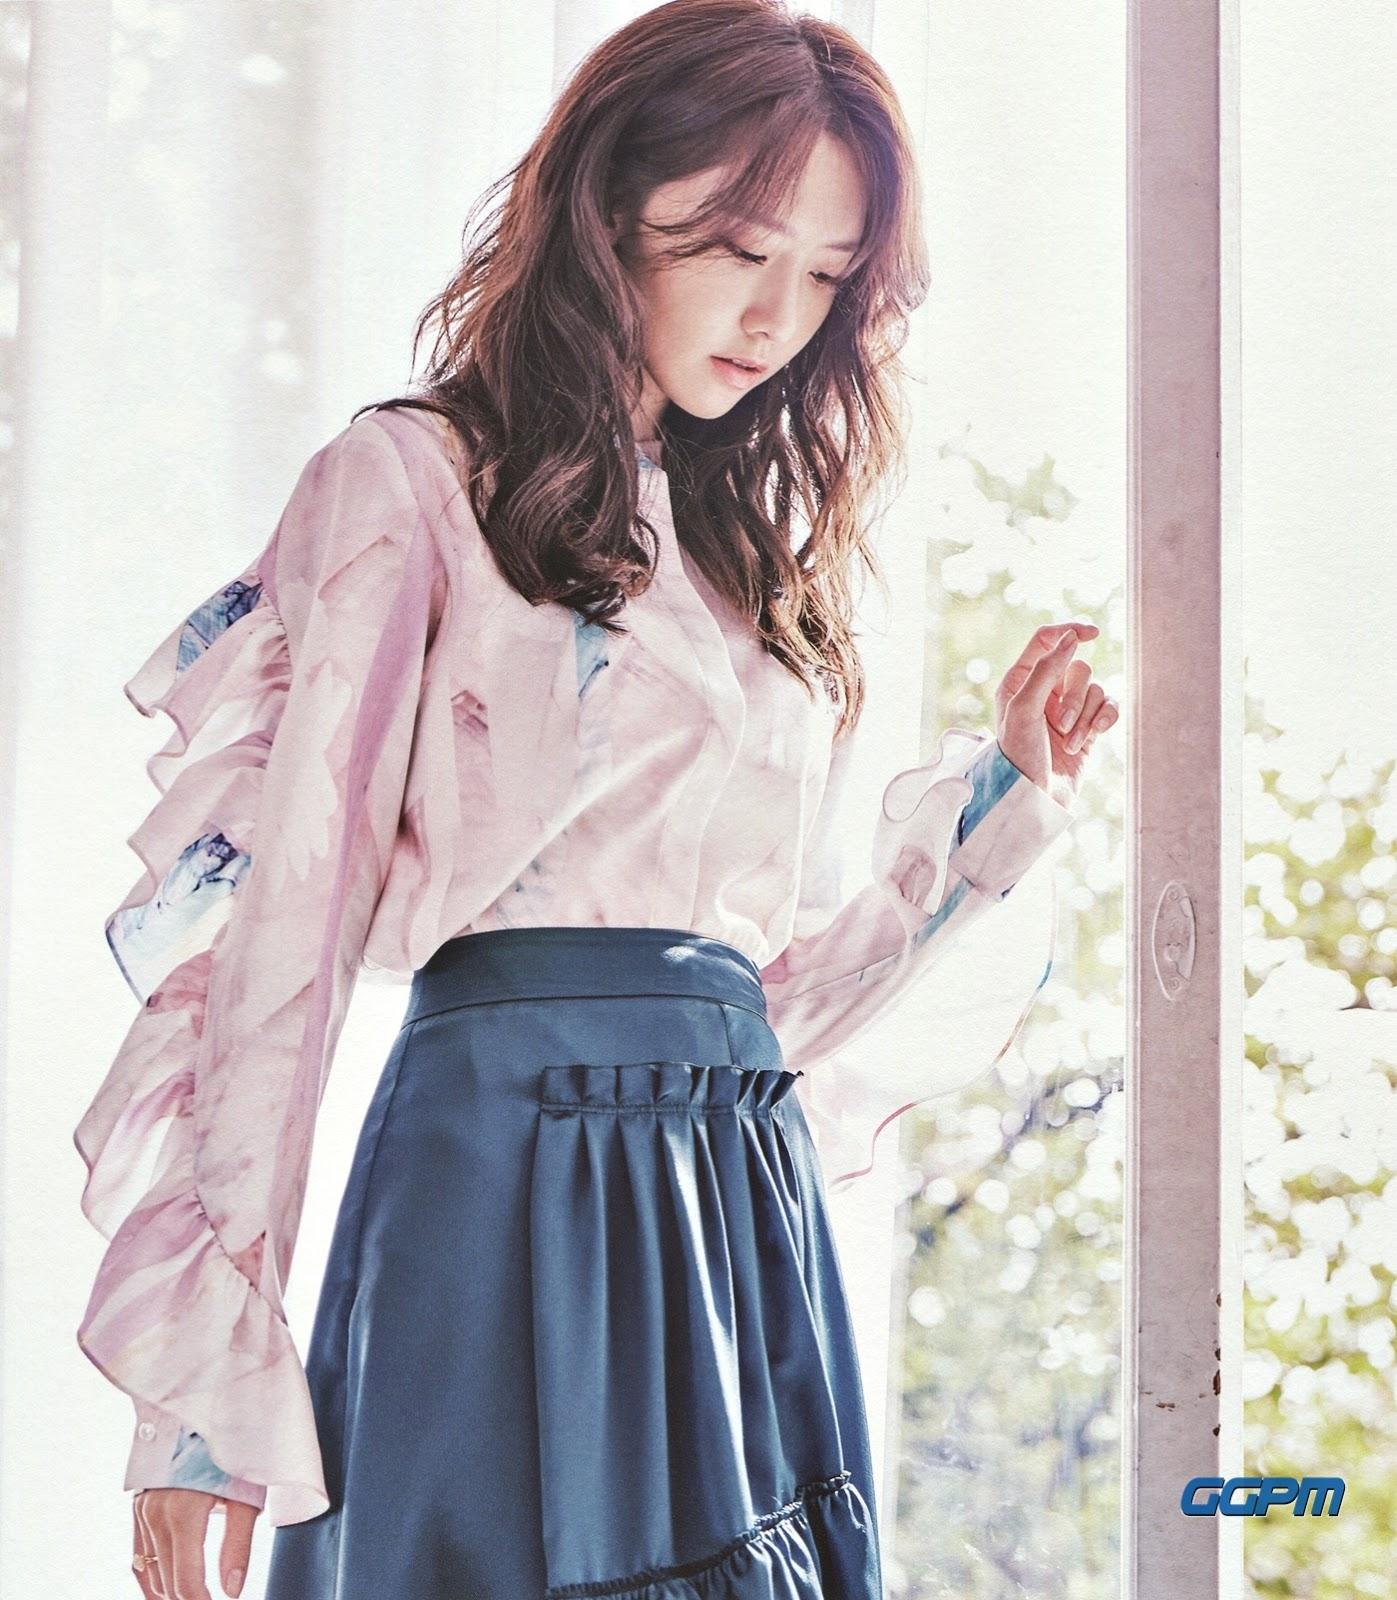 Yoona 「2017 SEASON'S GREETINGS」 Ordinary Days - Prologue ...